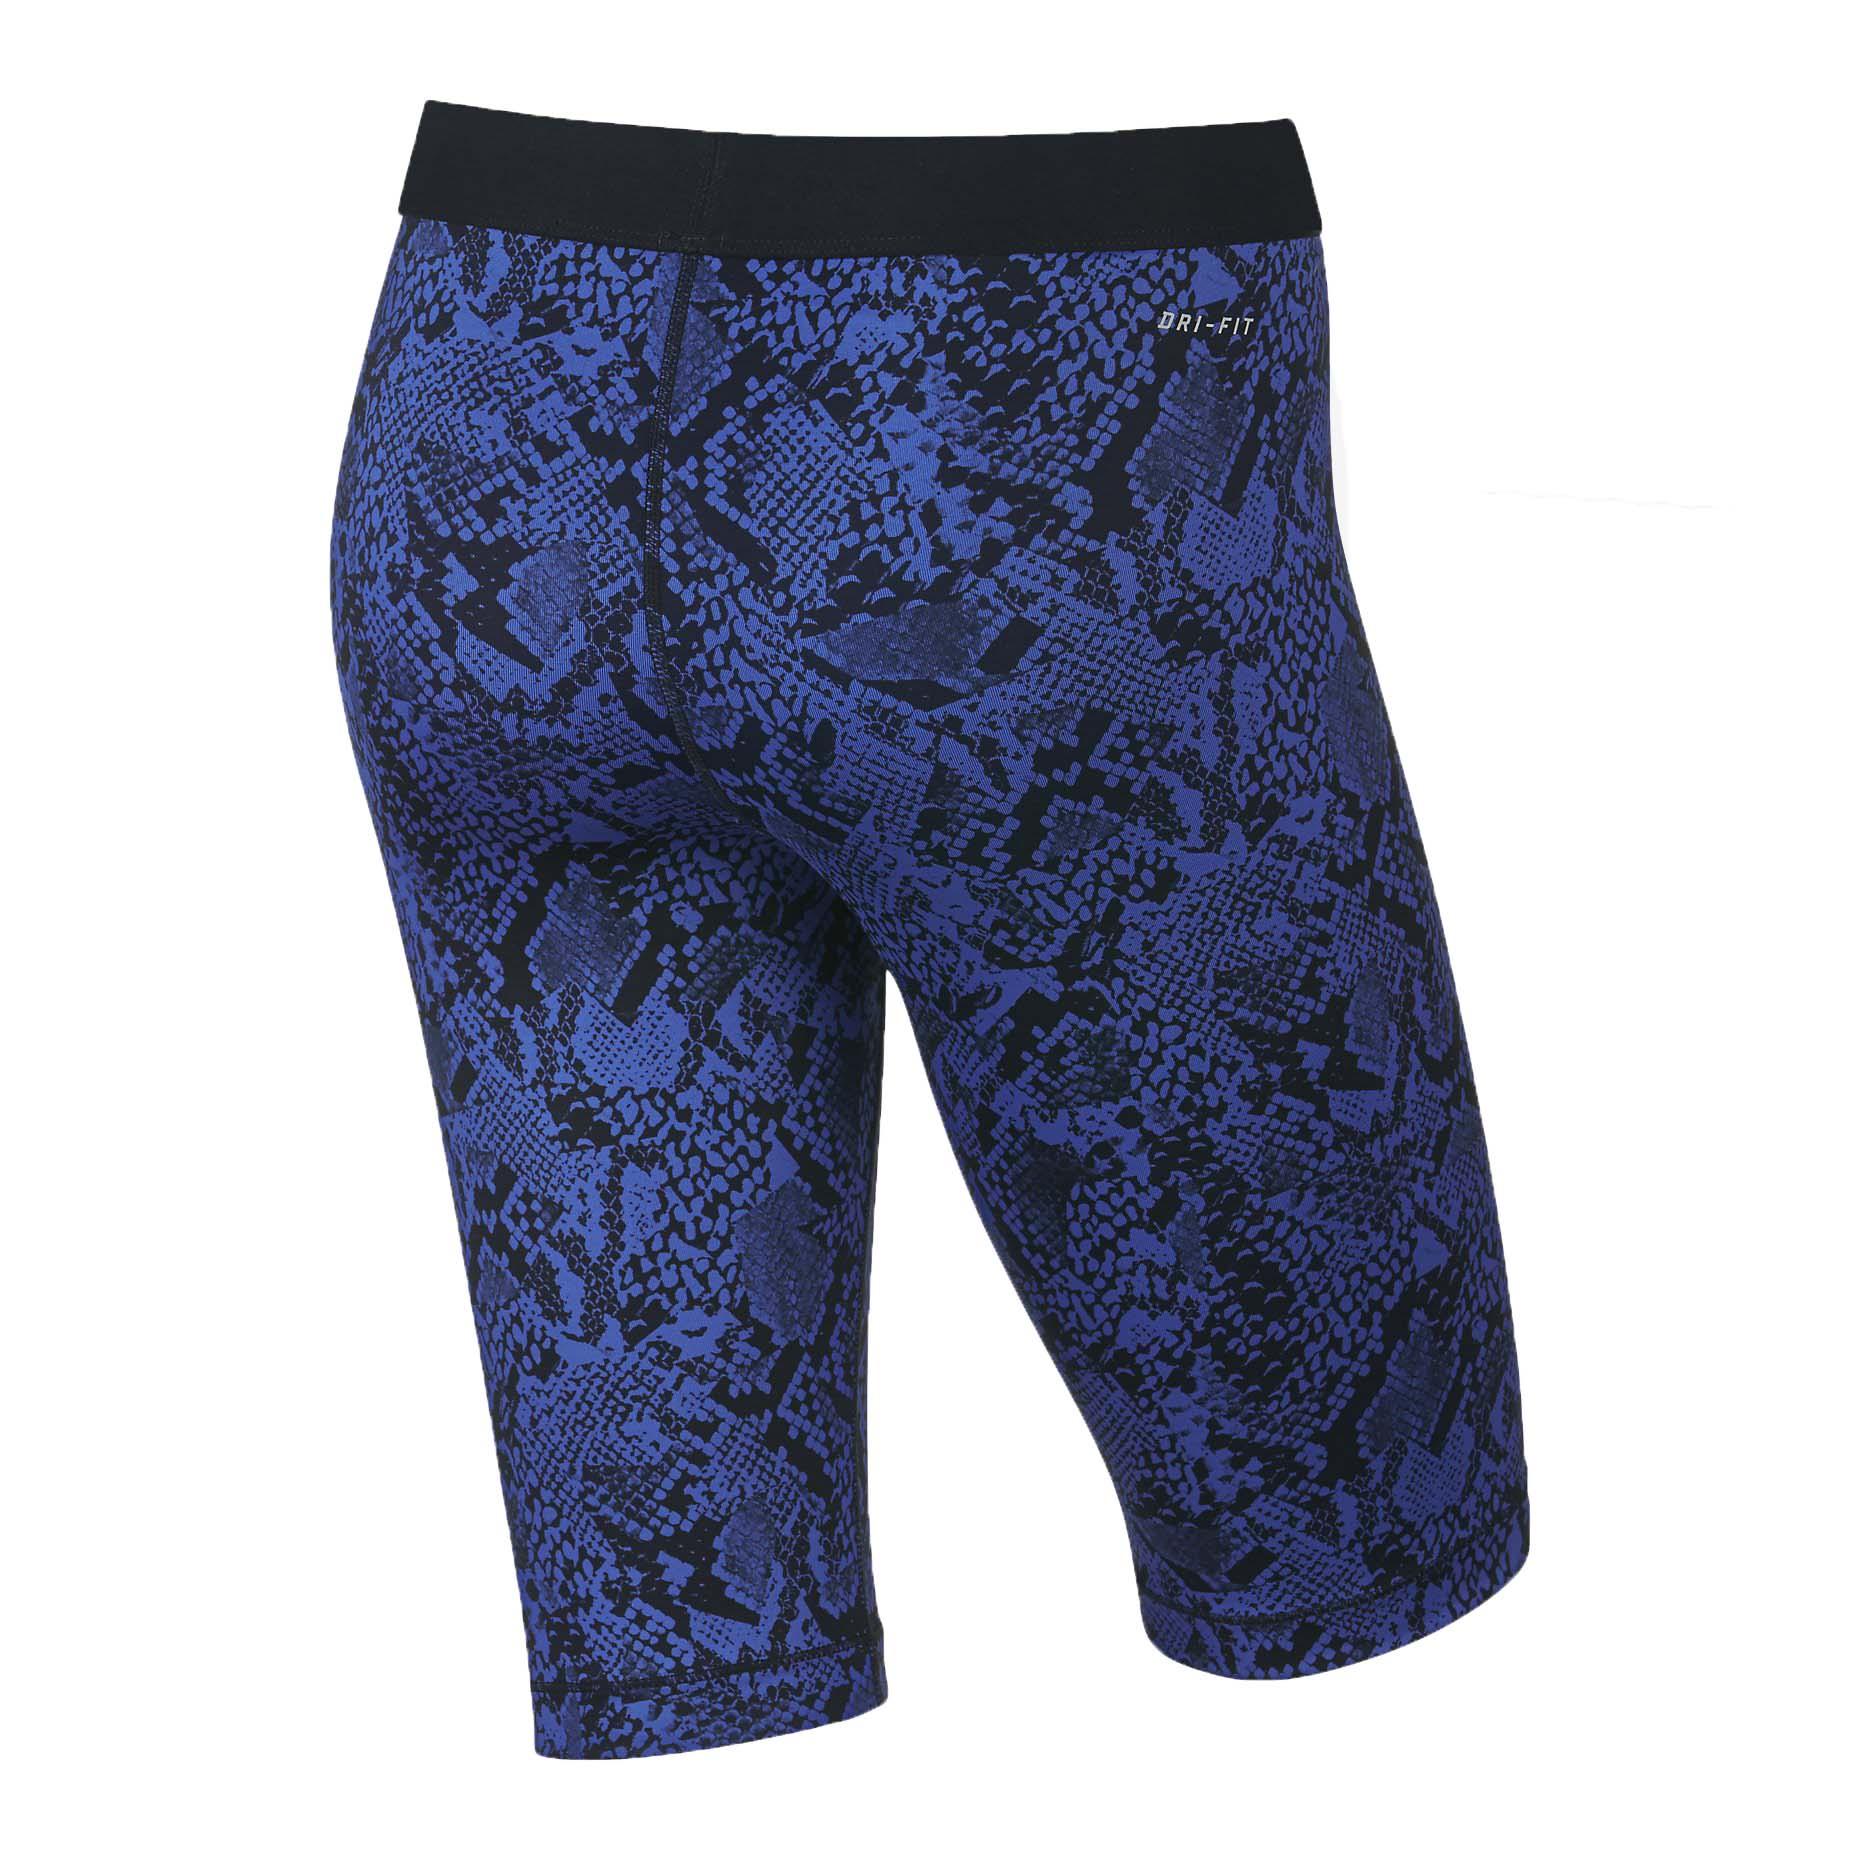 nike women 39 s dri fit pro 11 vixen training shorts ebay. Black Bedroom Furniture Sets. Home Design Ideas